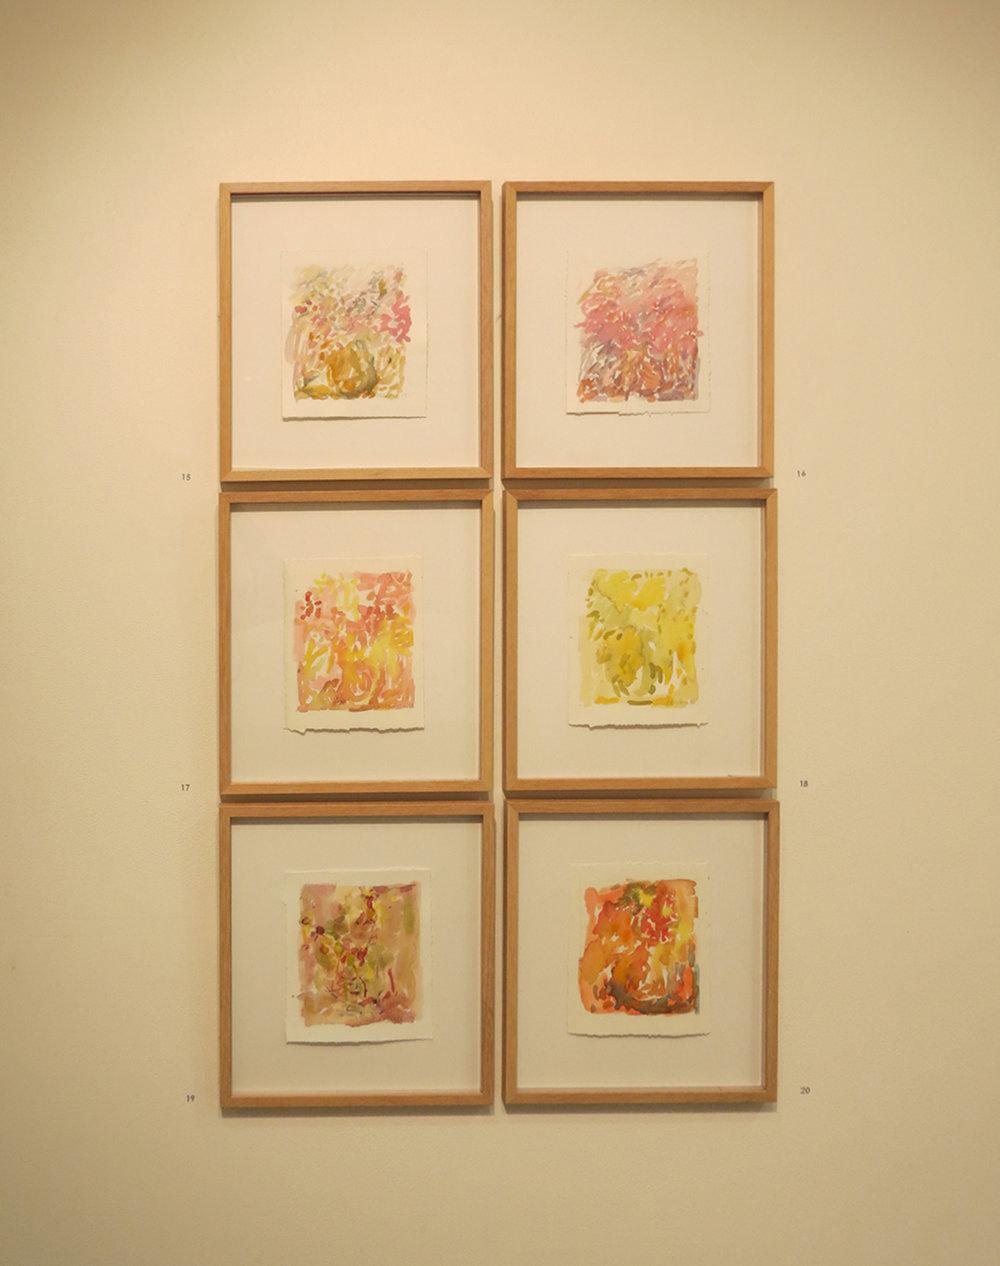 15. - 20. Jo Darvall, 'Still Life Study 1-6' Installation view, 2015, Watercolour on paper, 16 x 14cm, $680ea